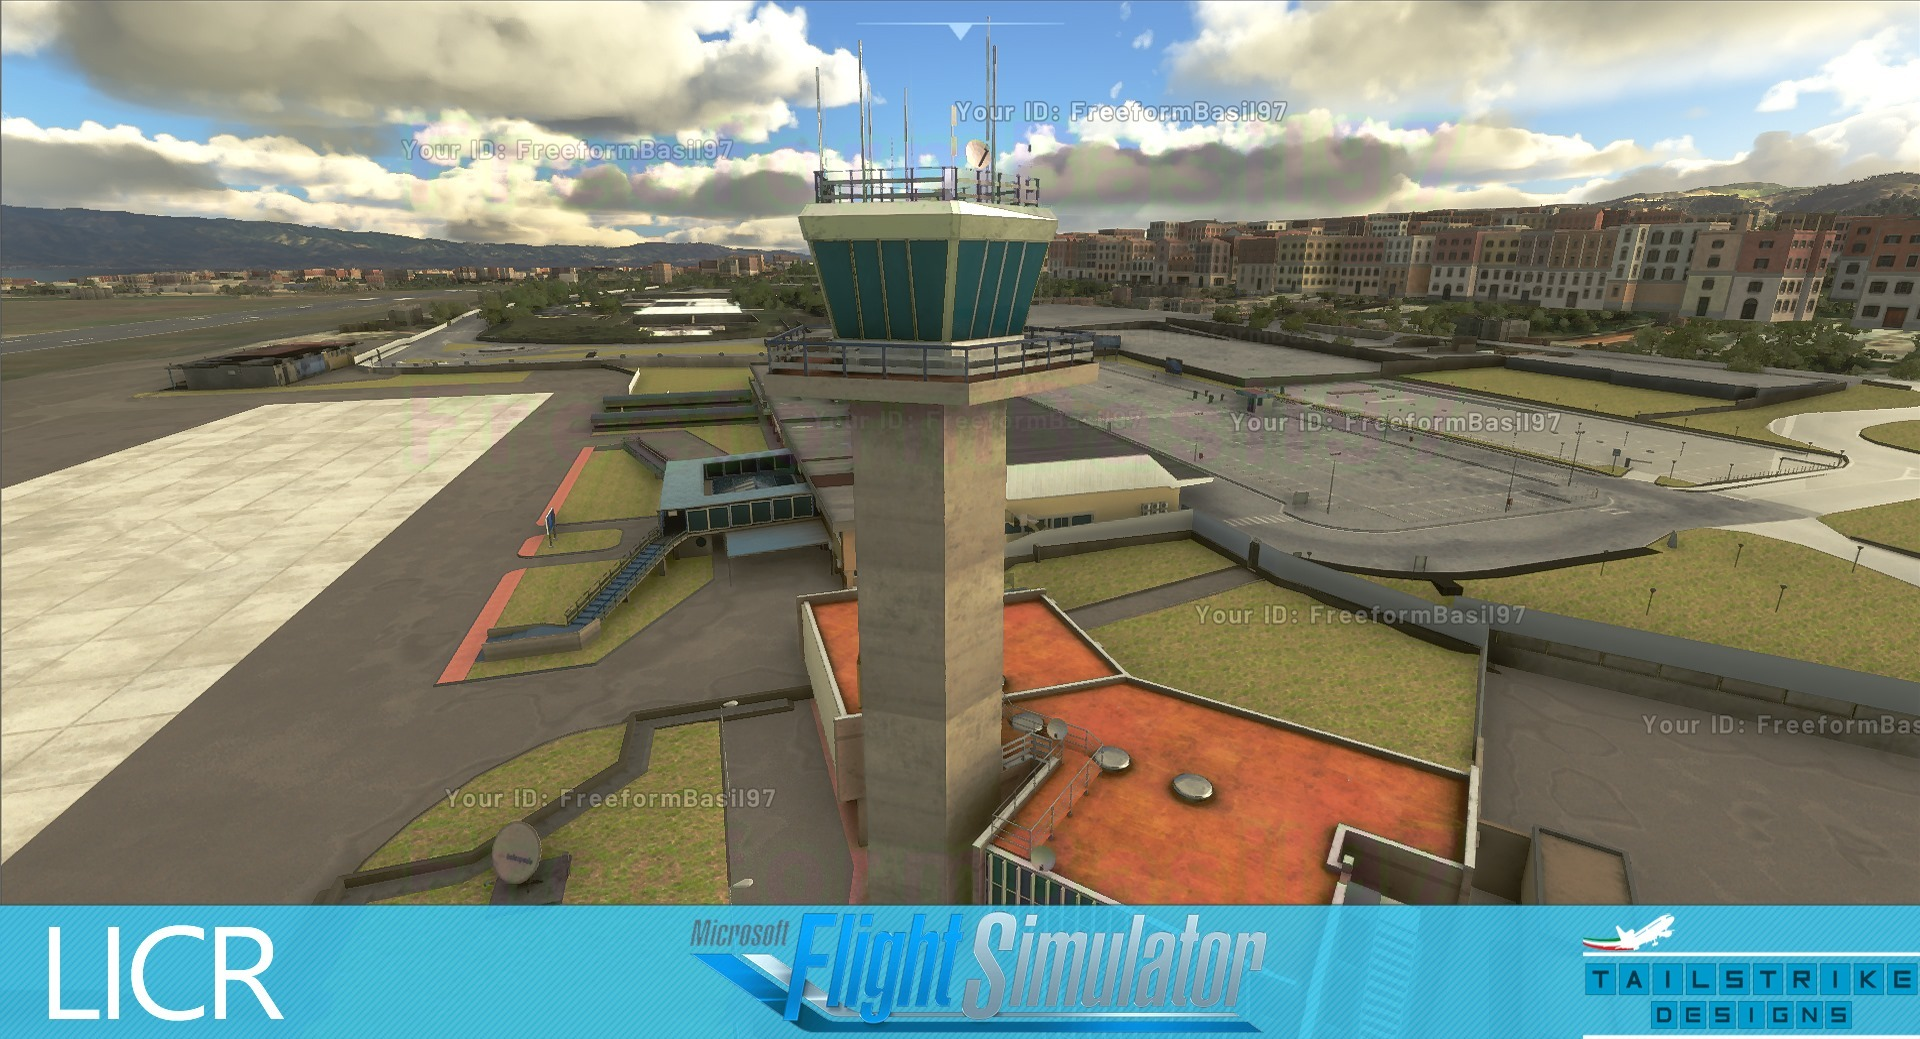 Tailstrike Designs Previews Reggio Calabria Airport for MSFS